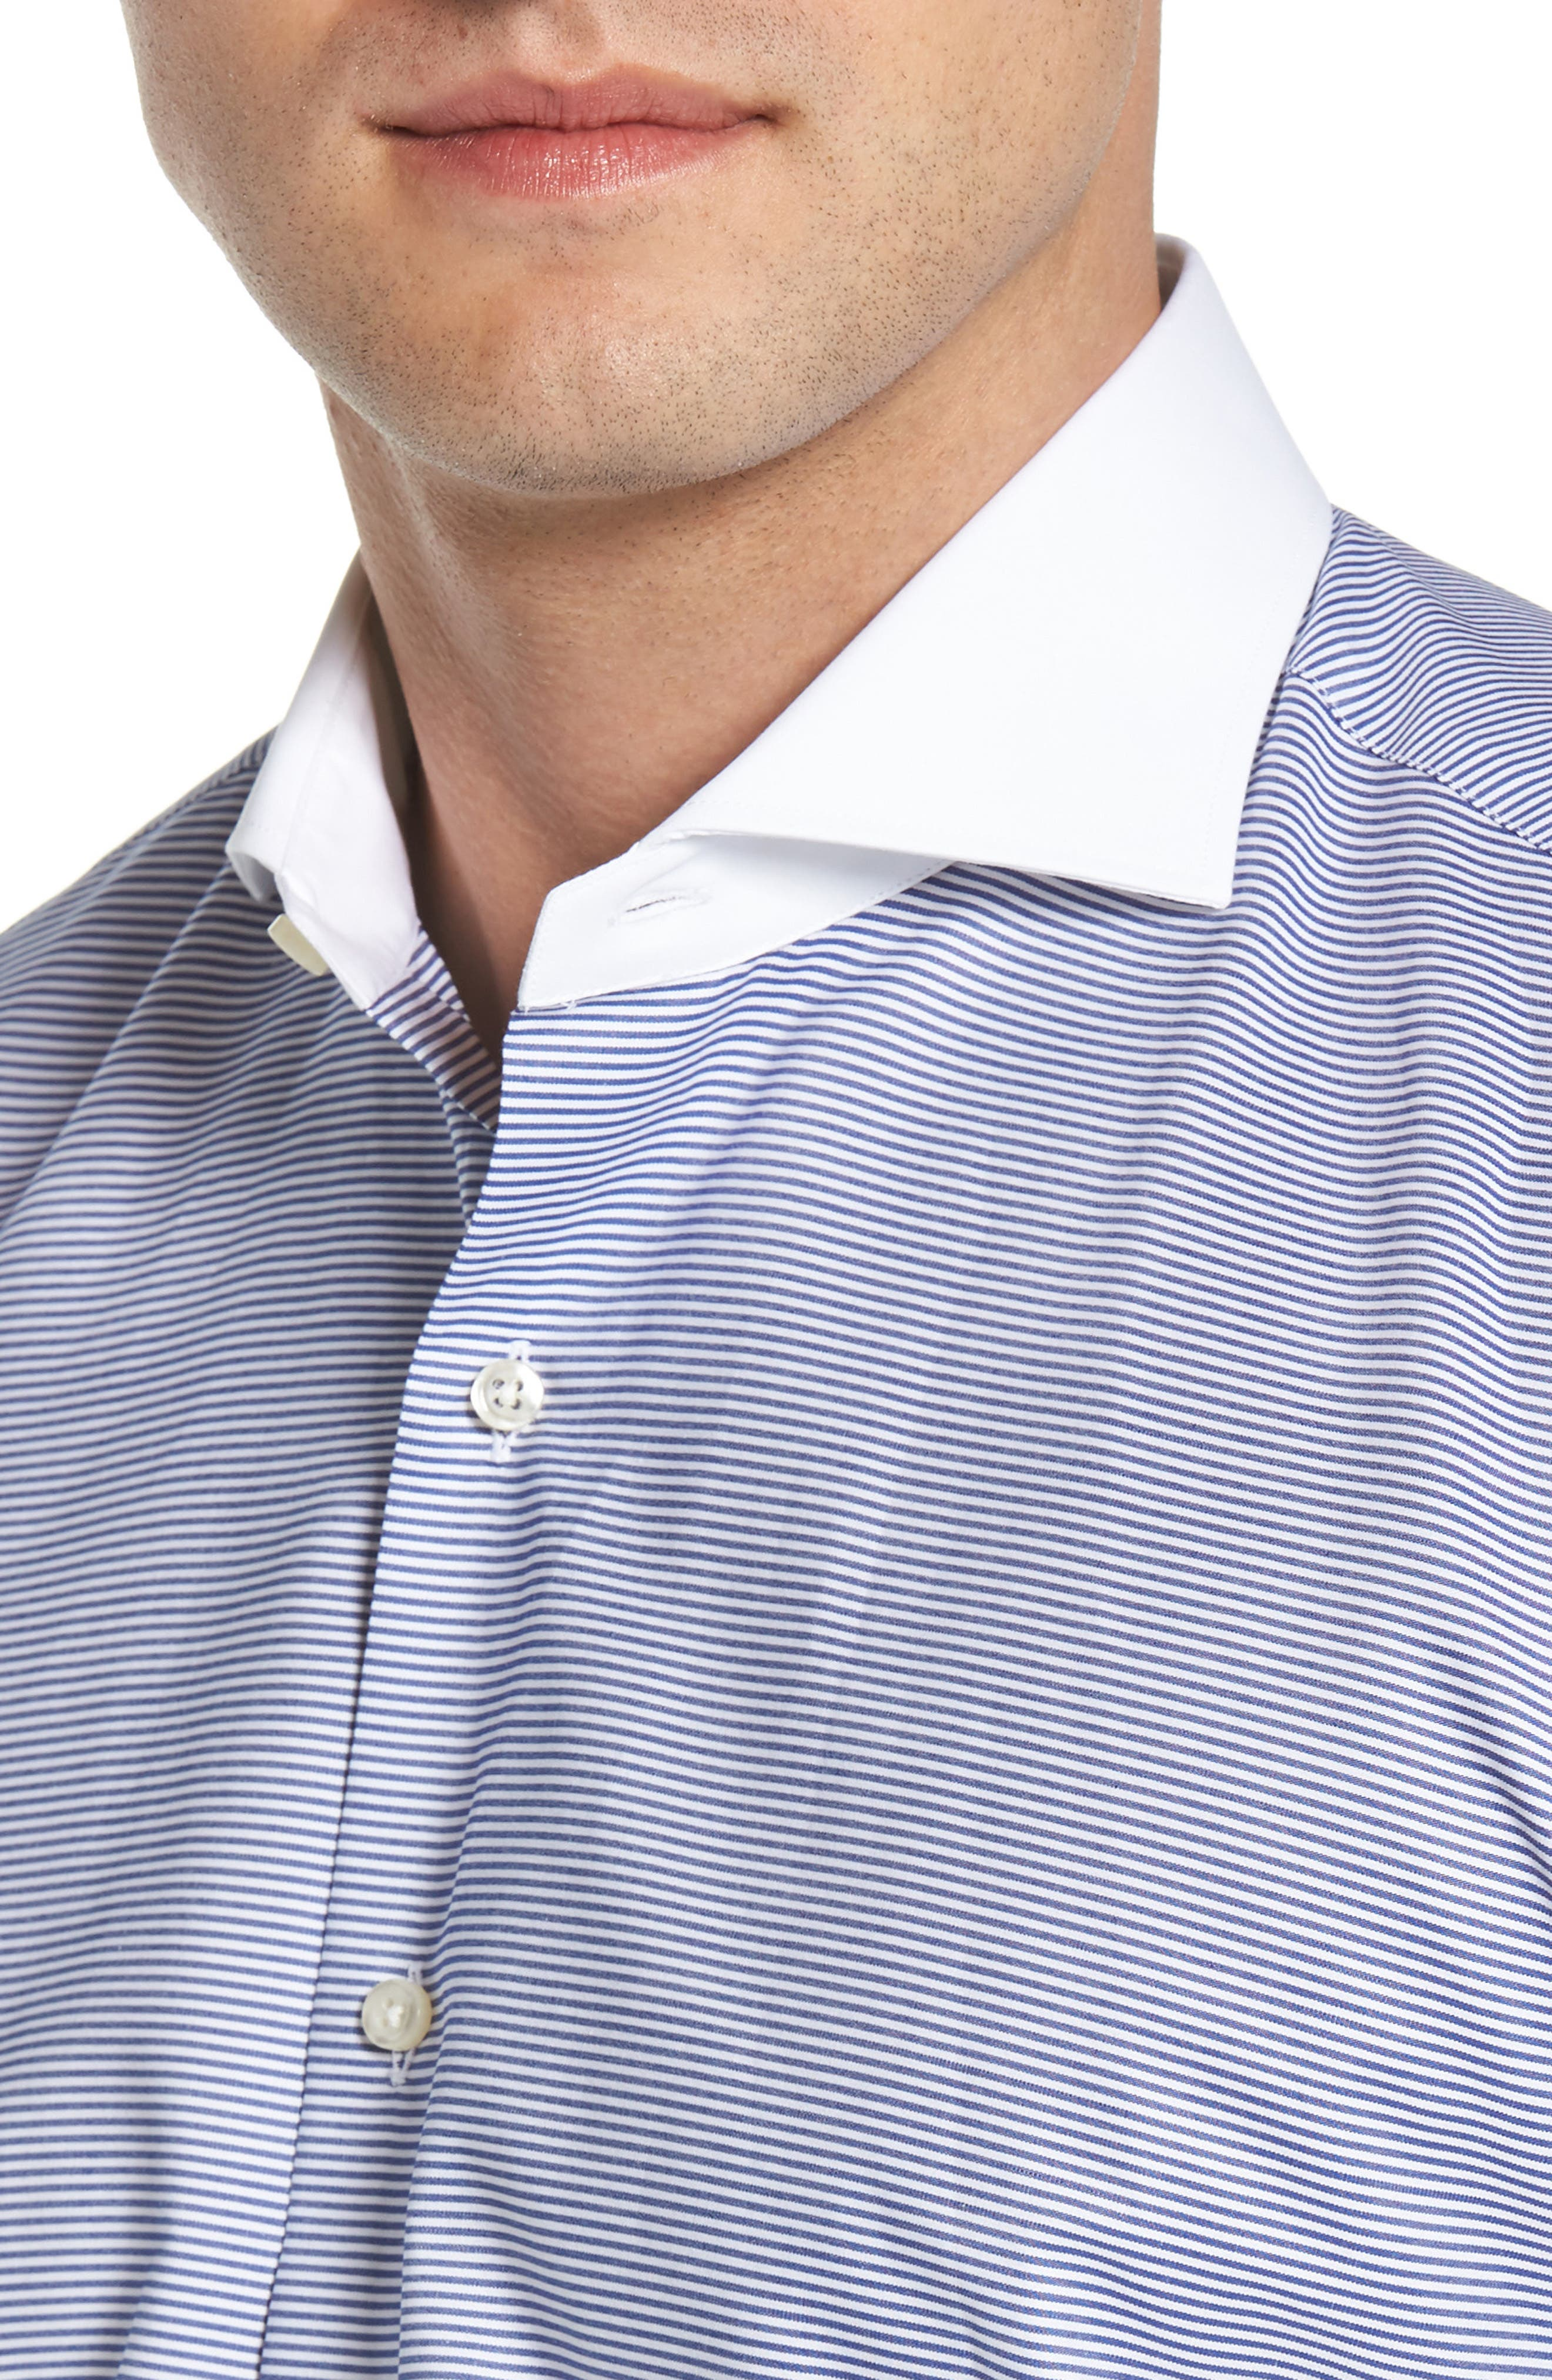 Regular Fit Stripe Dress Shirt,                             Alternate thumbnail 2, color,                             400